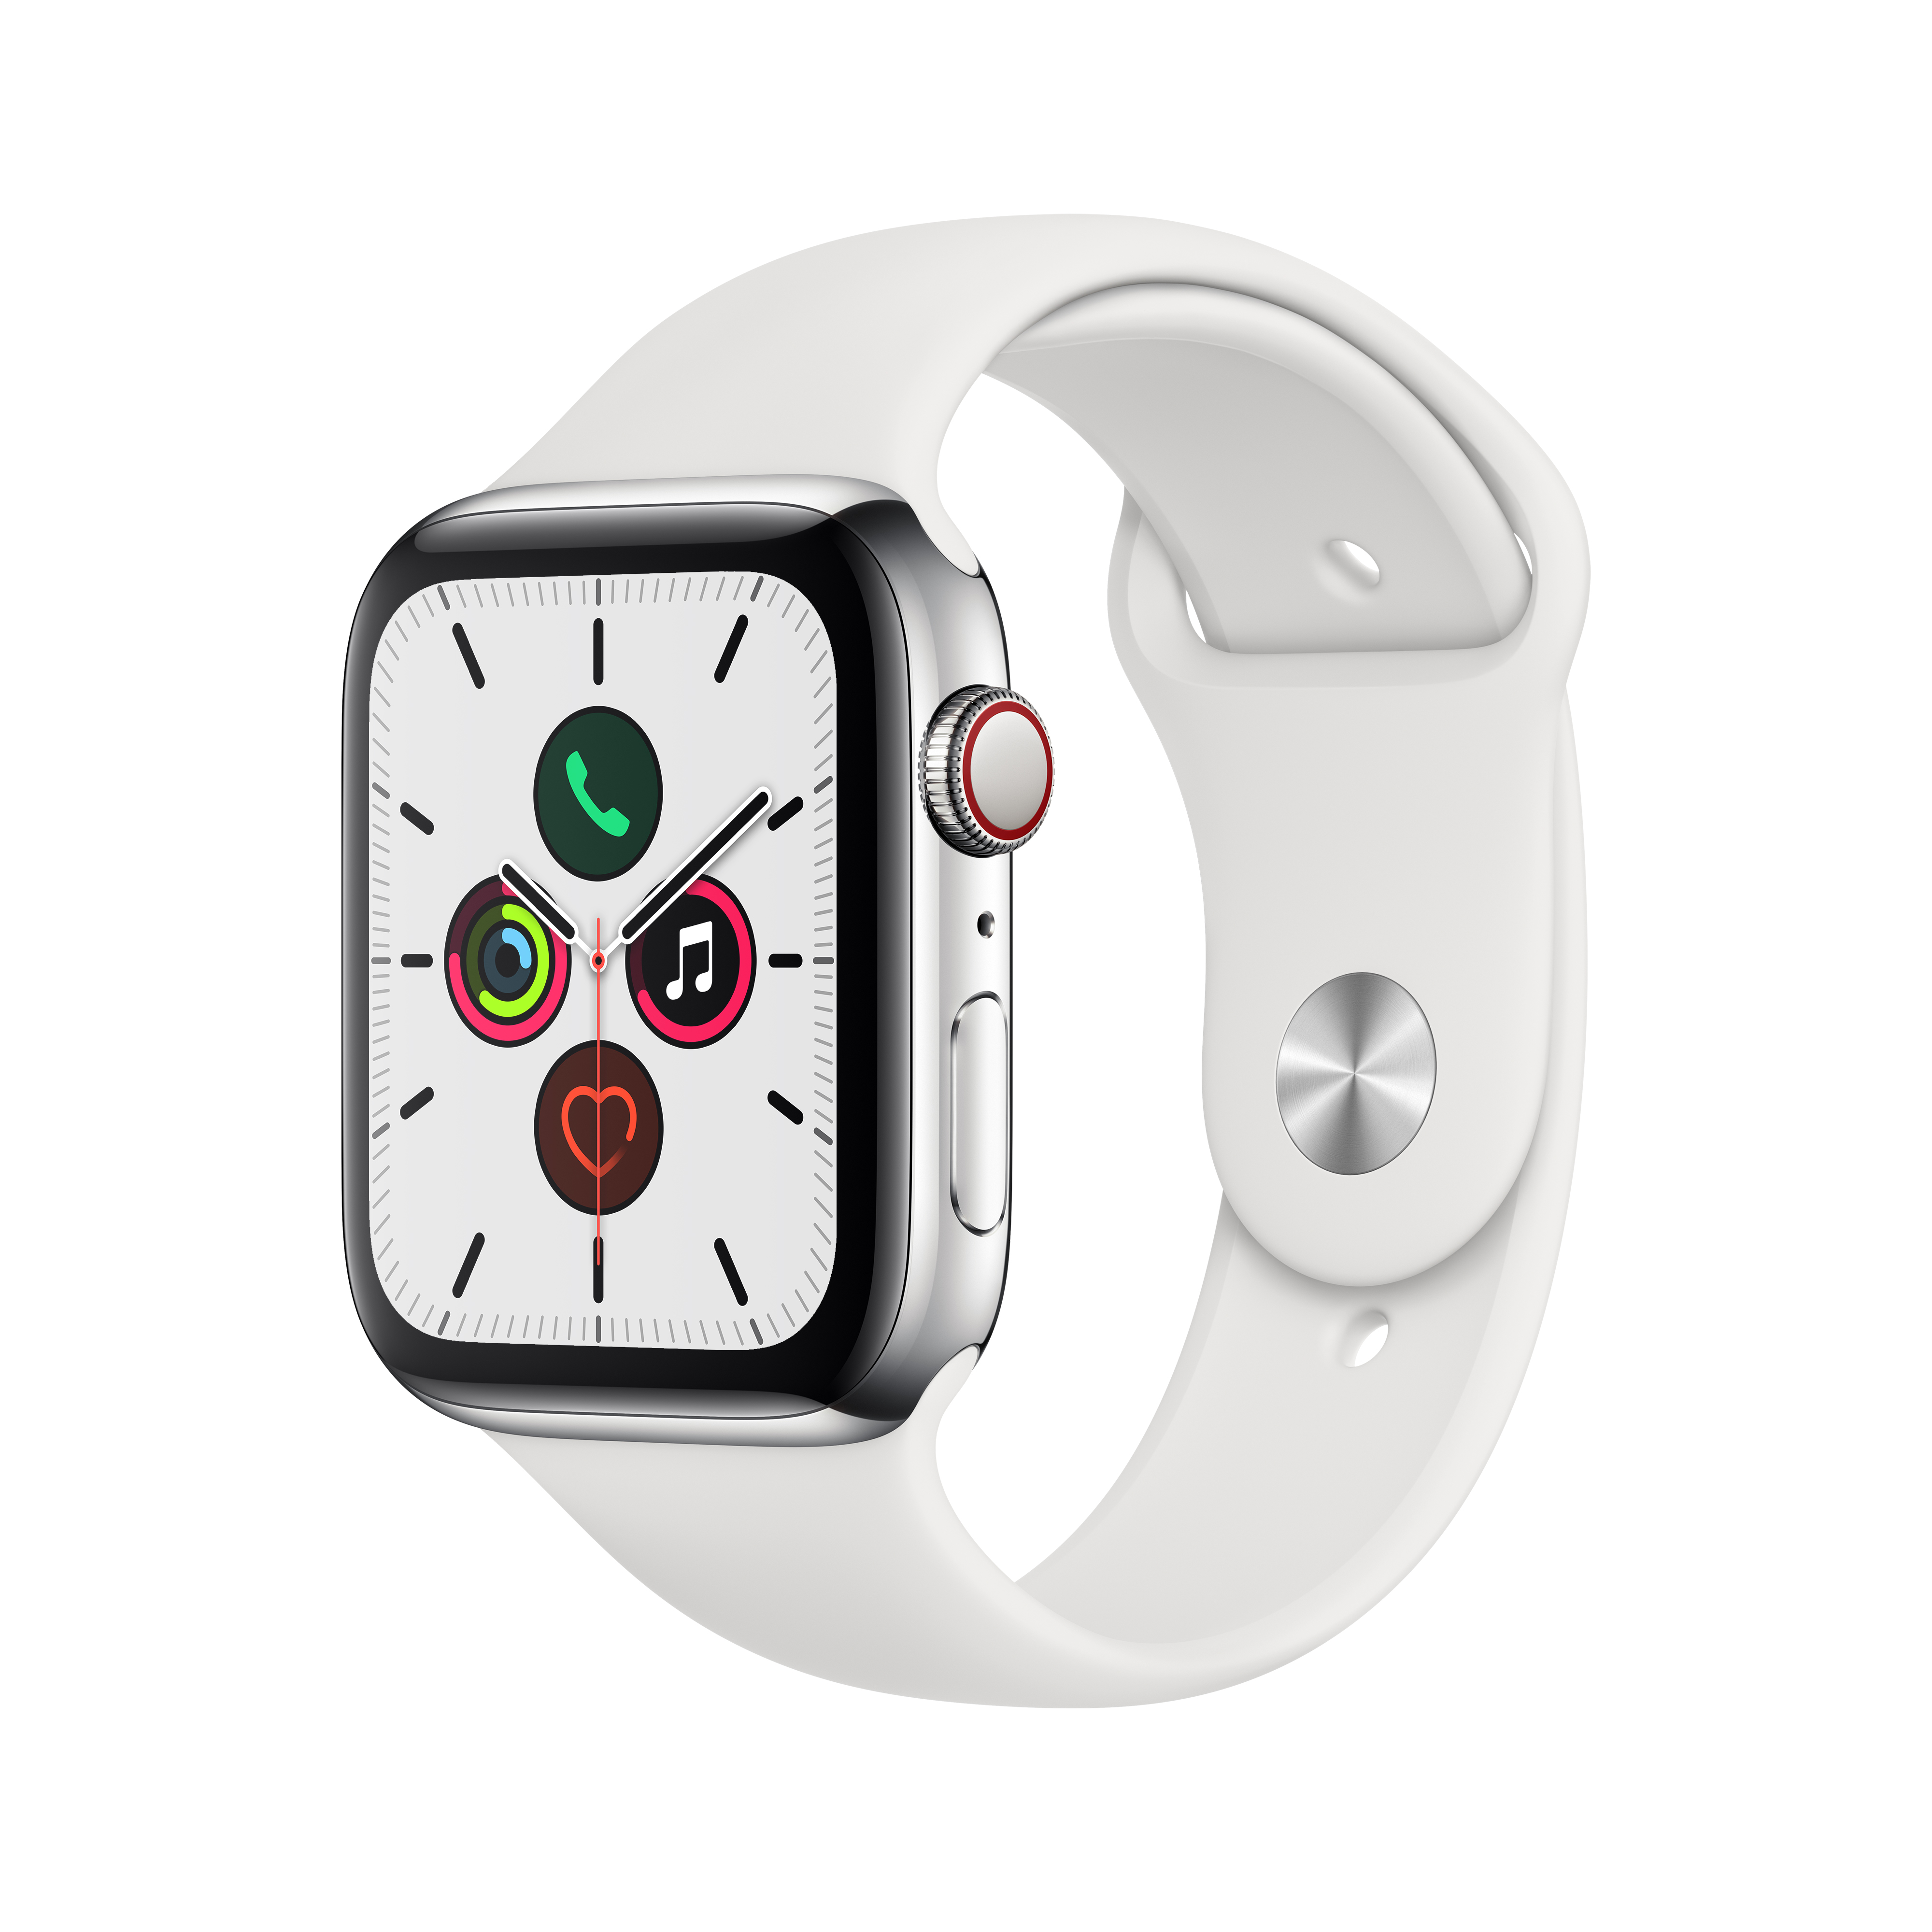 Apple 애플워치5 GPS + 셀룰러 44mm 스포츠밴드 + 스테인리스스틸 케이스, 스테인리스 스틸(MWWF2KH/A), 화이트(밴드)